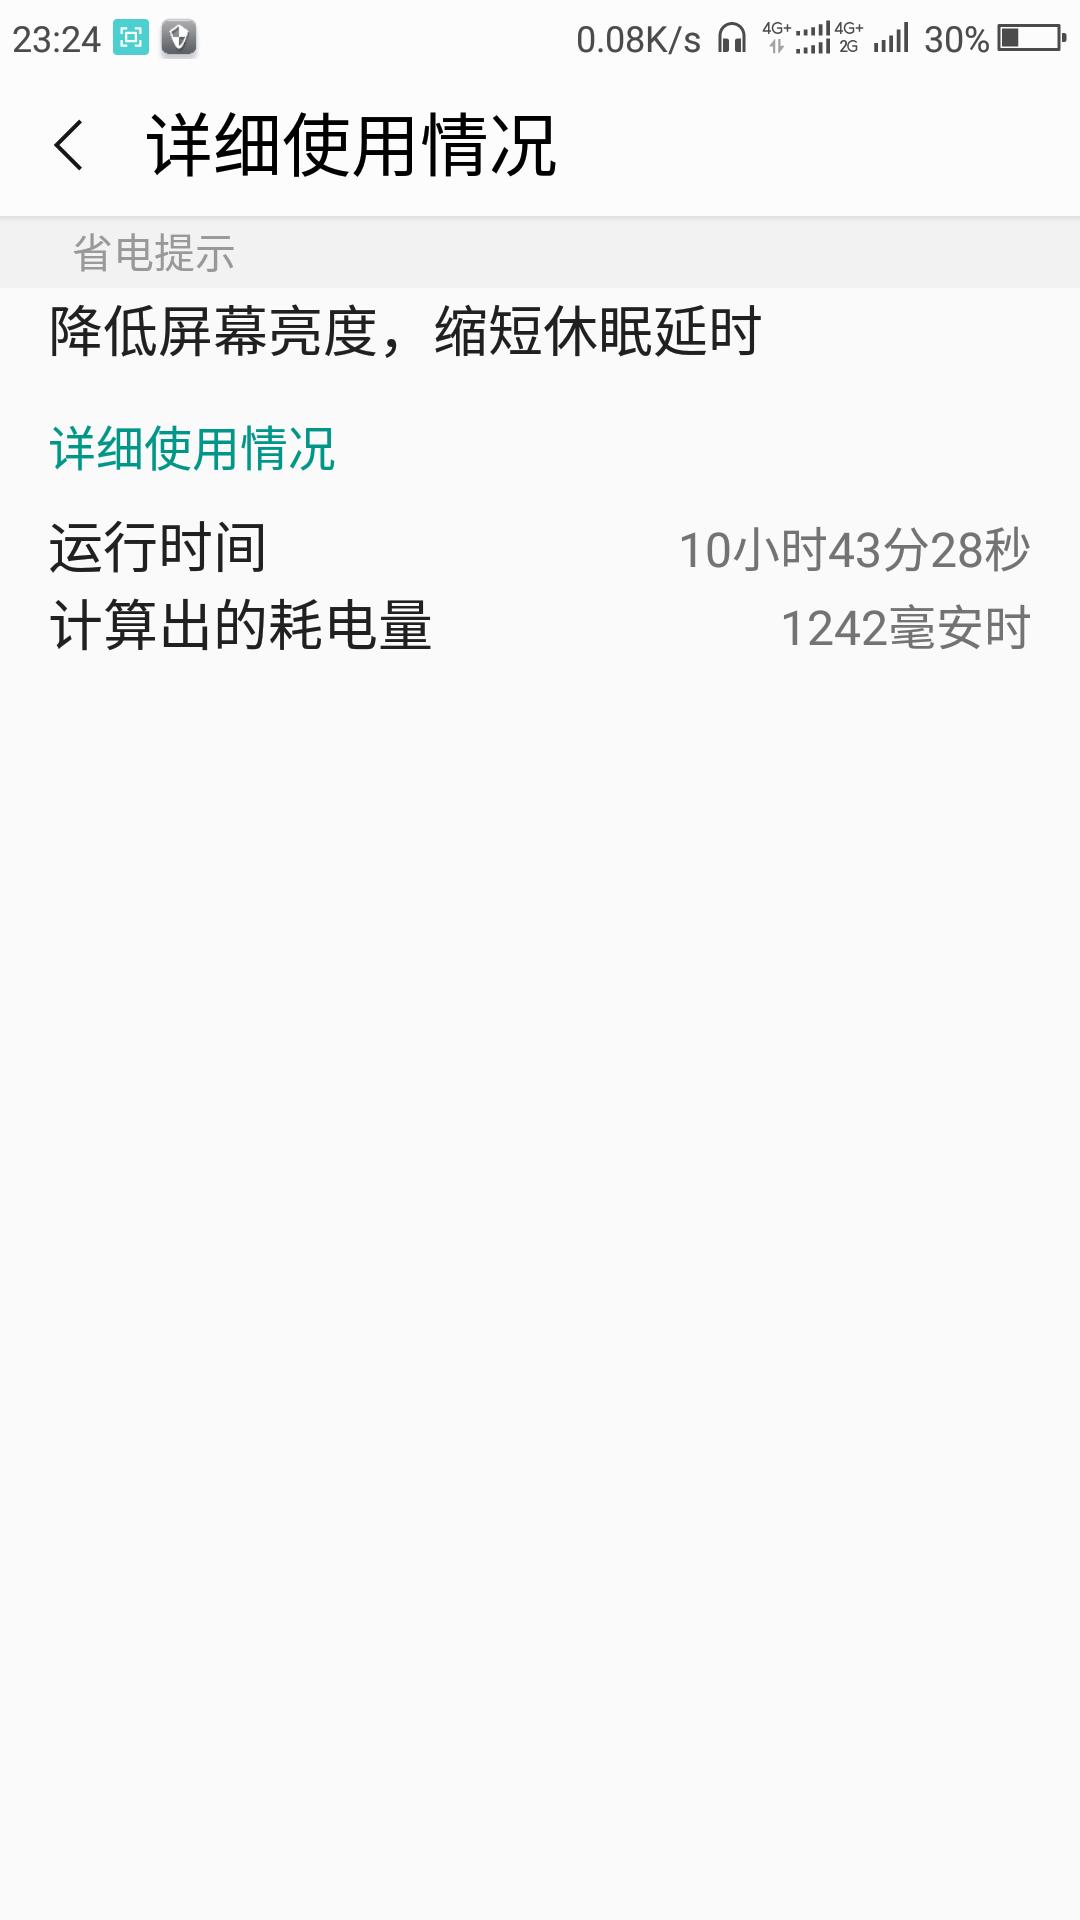 Screenshot_2016-11-21-23-24-27.png